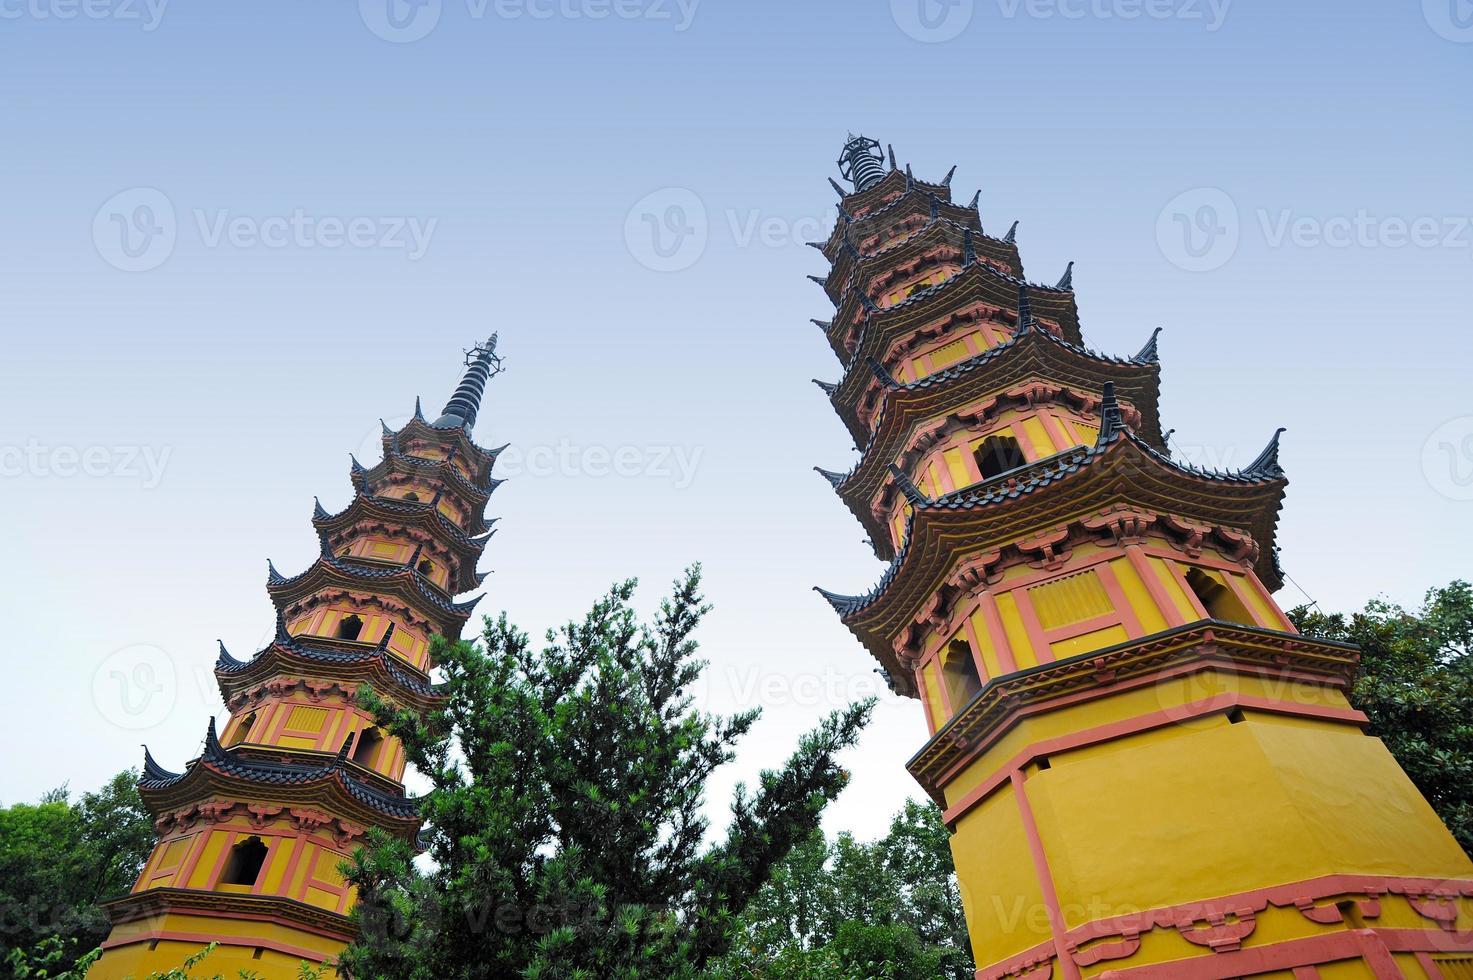 pagodas gemelas budistas en suzhou - china foto